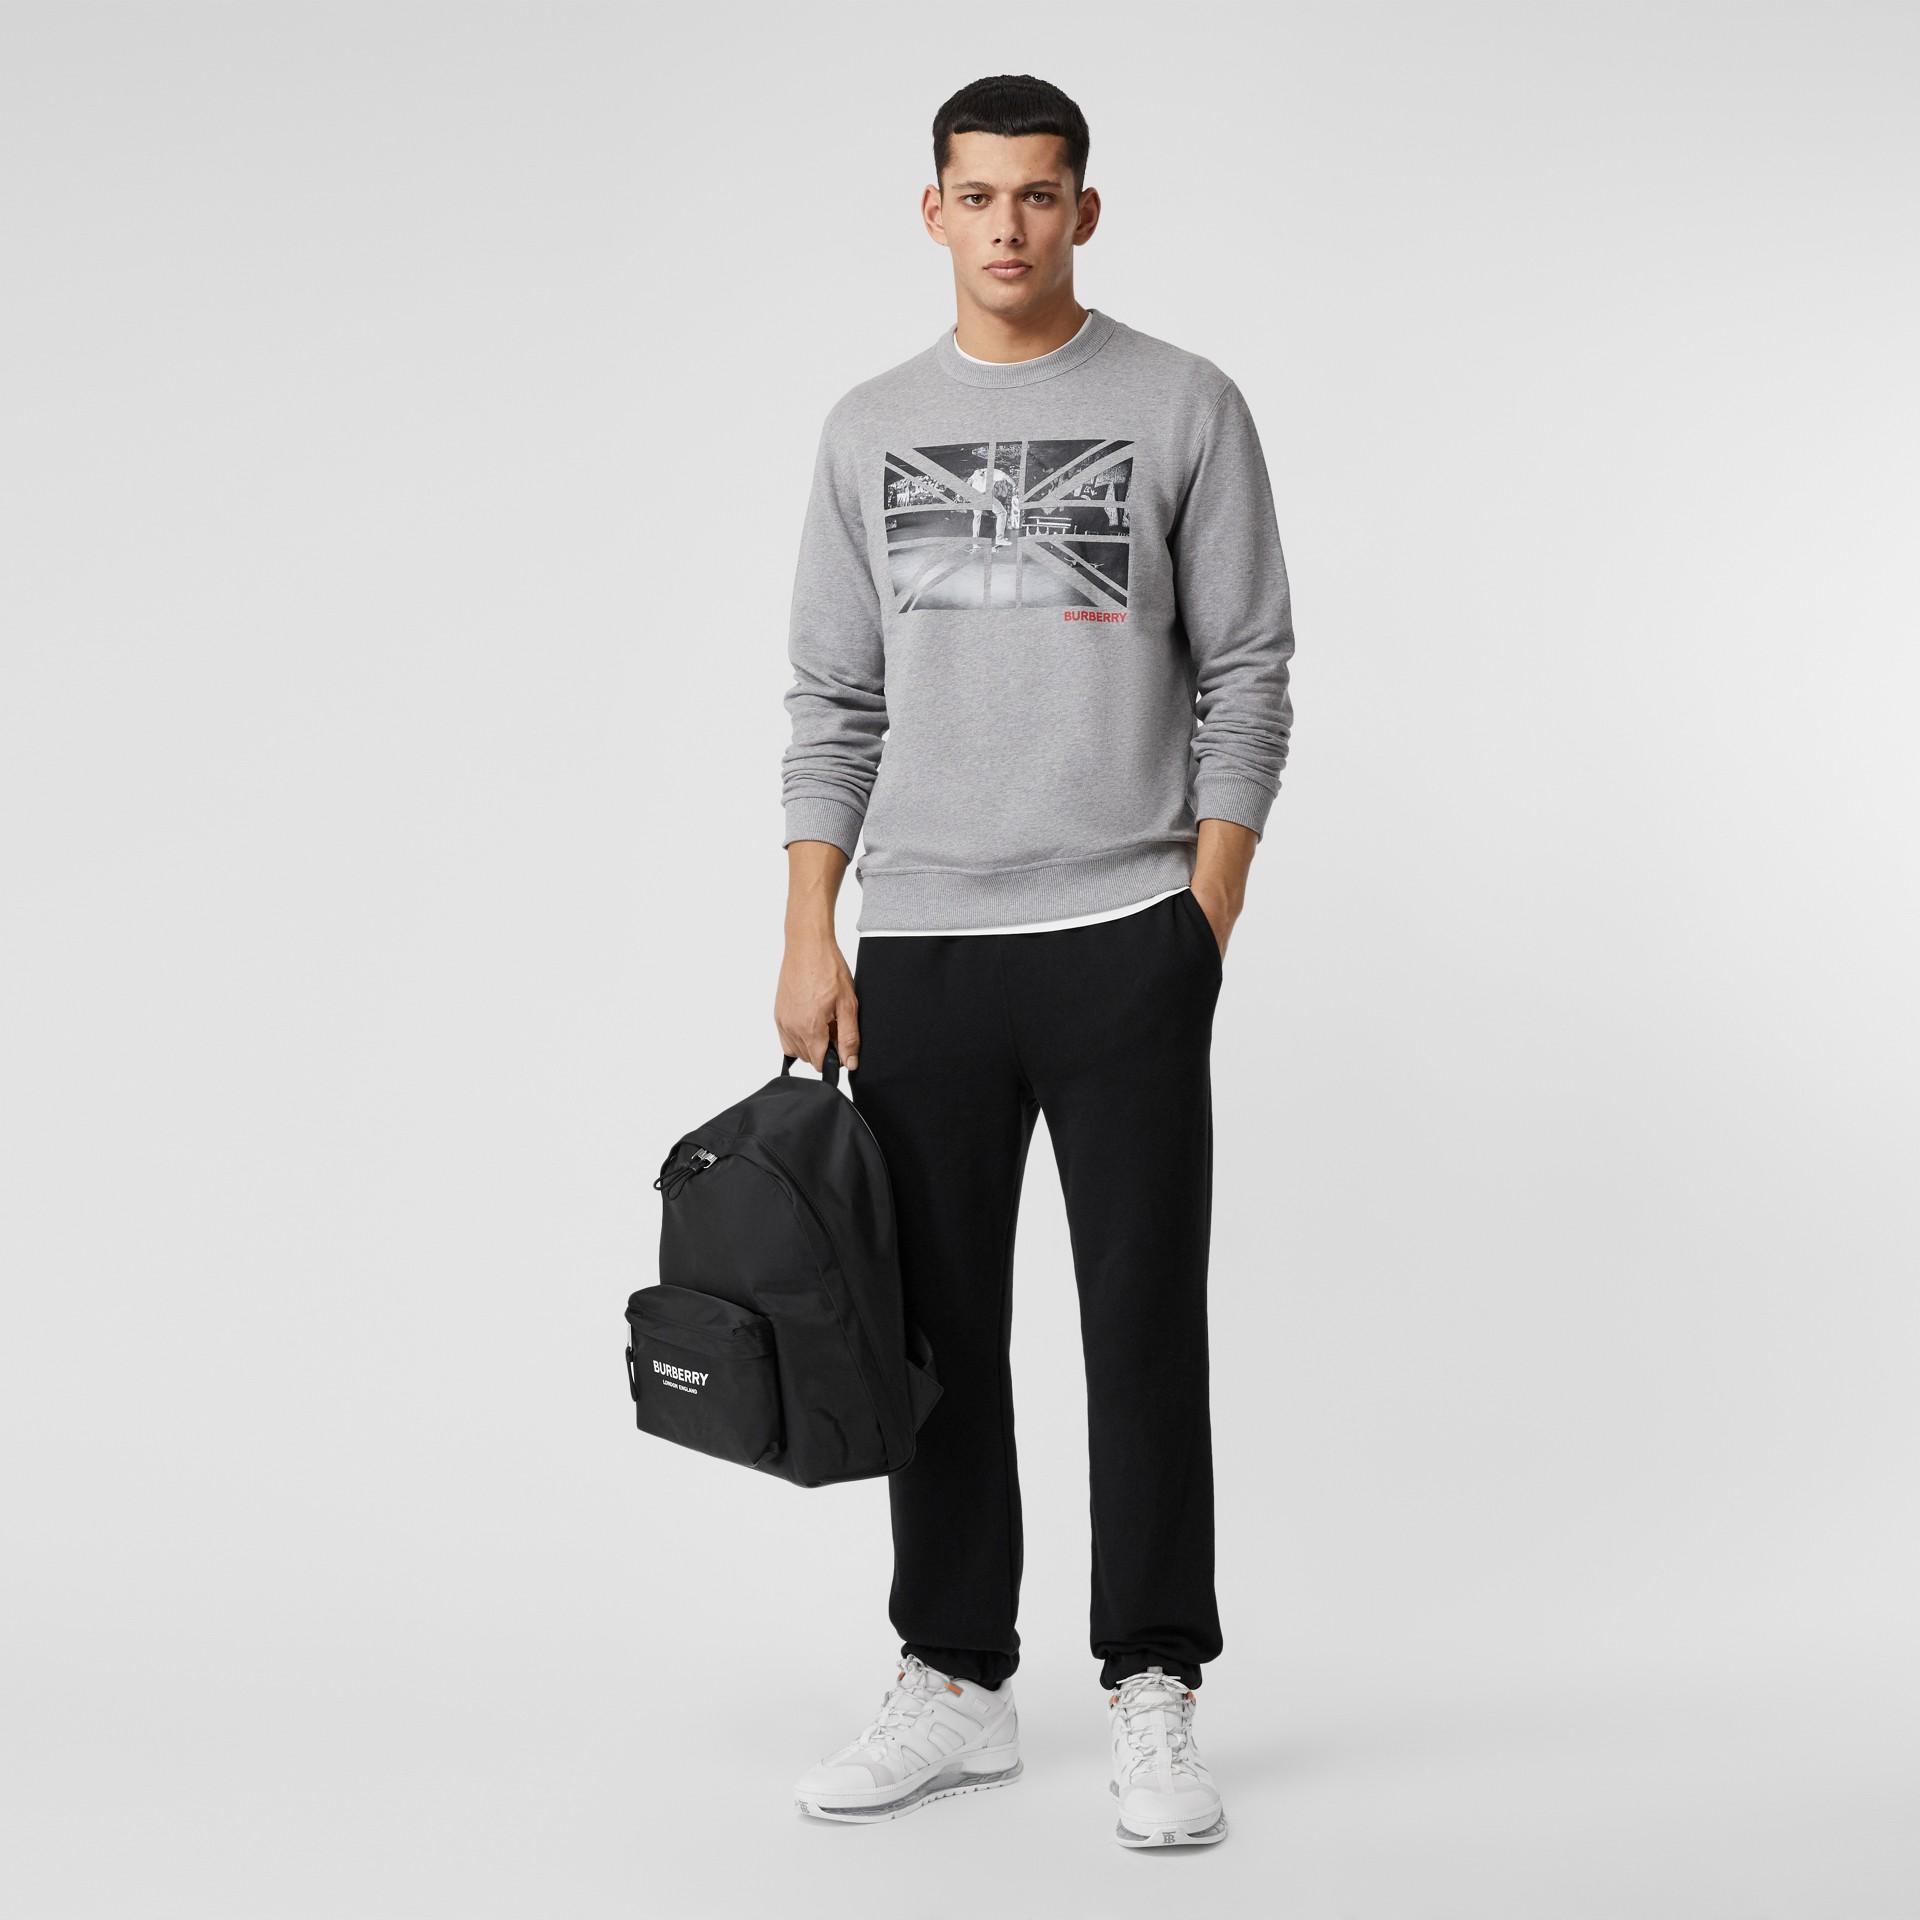 Union Jack Photo Print Cotton Sweatshirt in Pale Grey Melange - Men | Burberry - gallery image 4